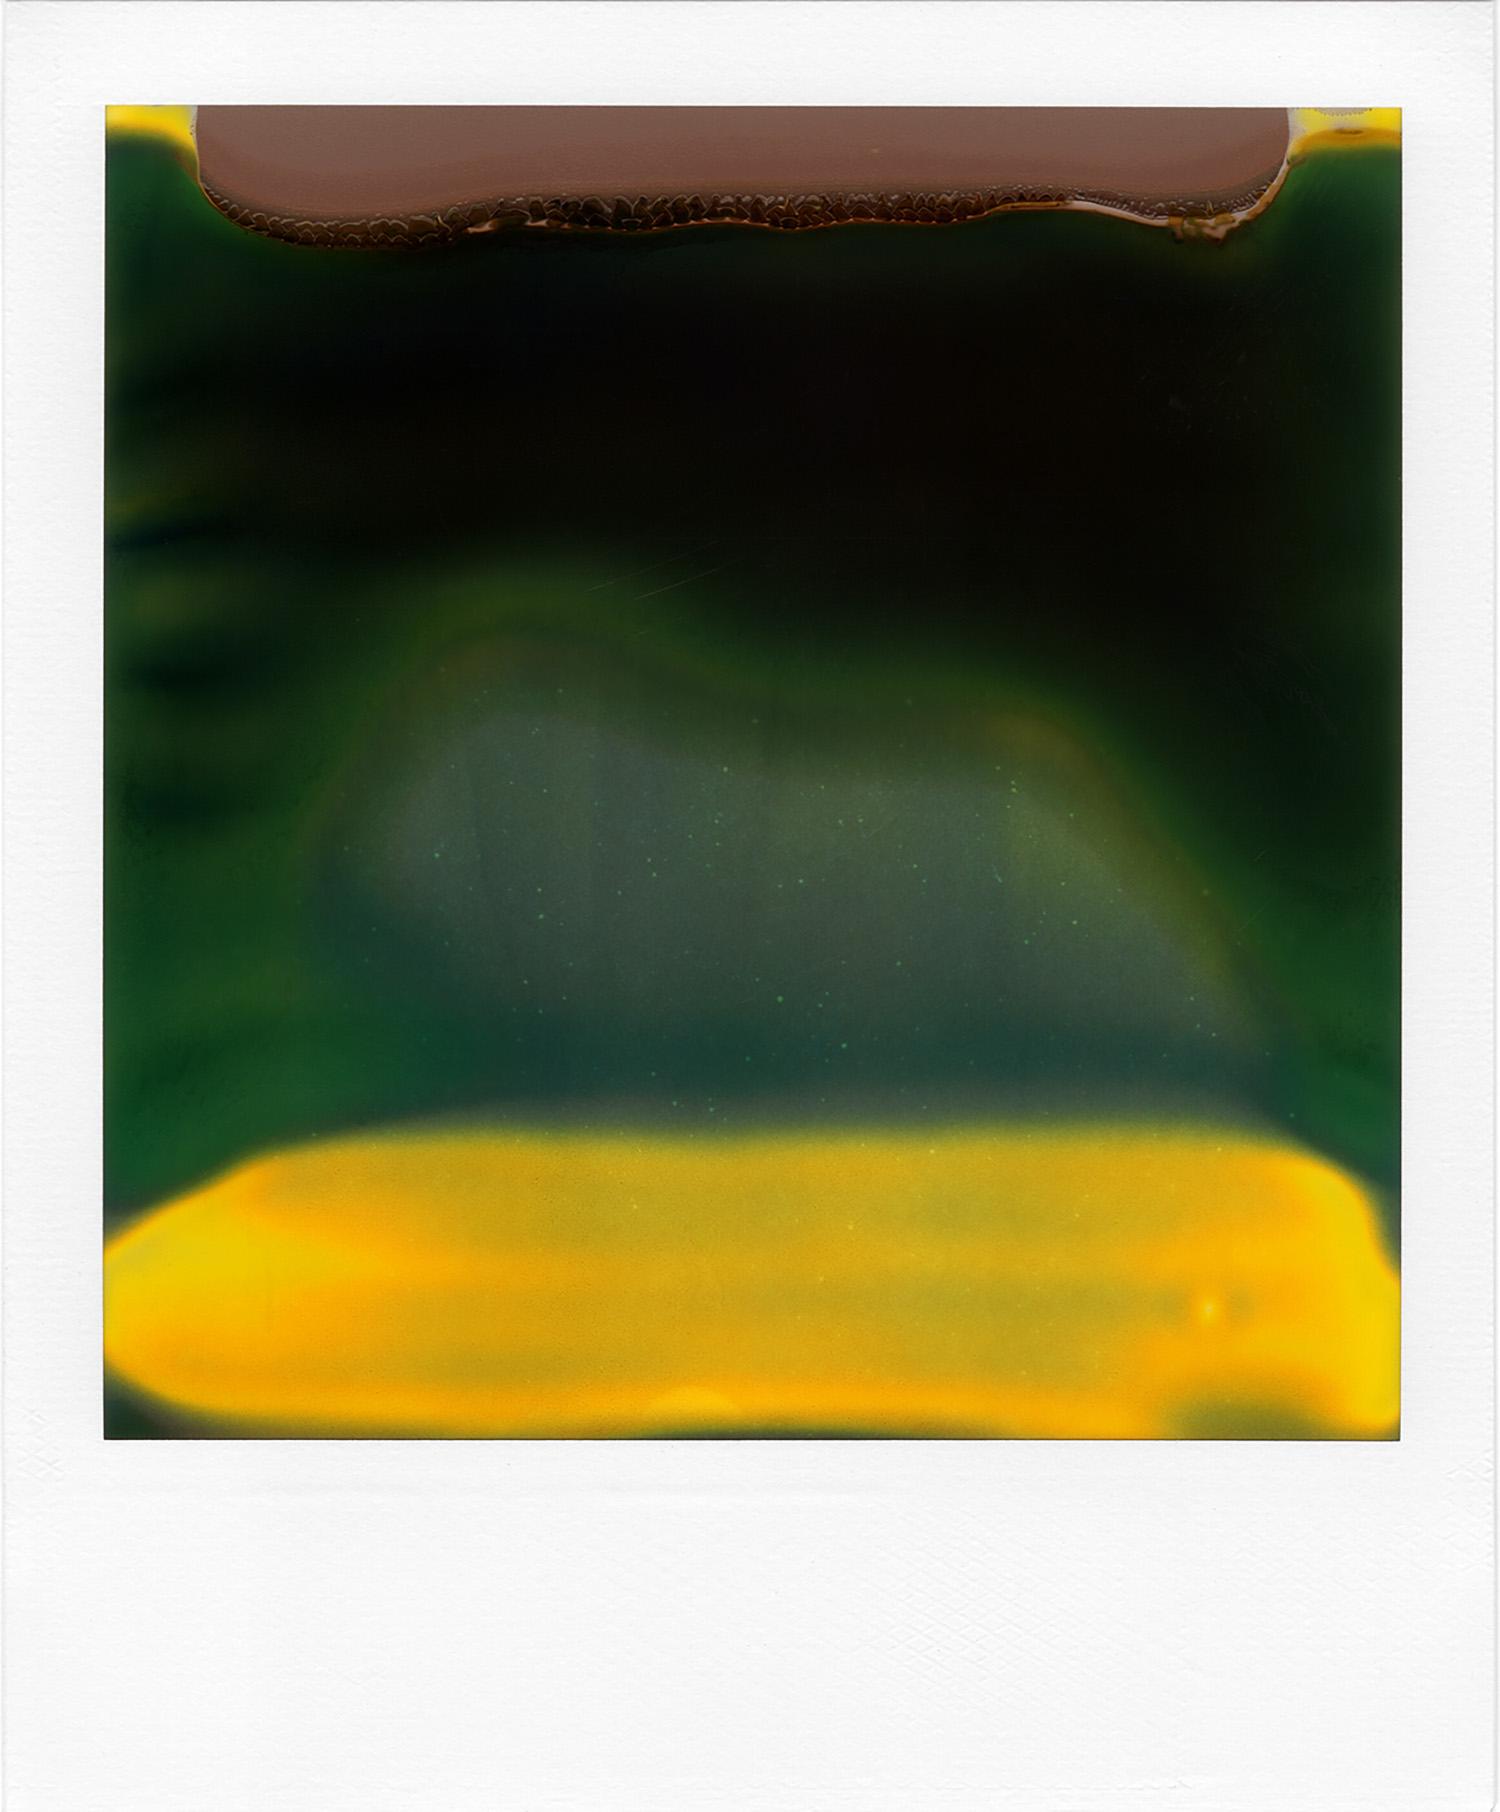 Ruined Polaroid #40, 2011